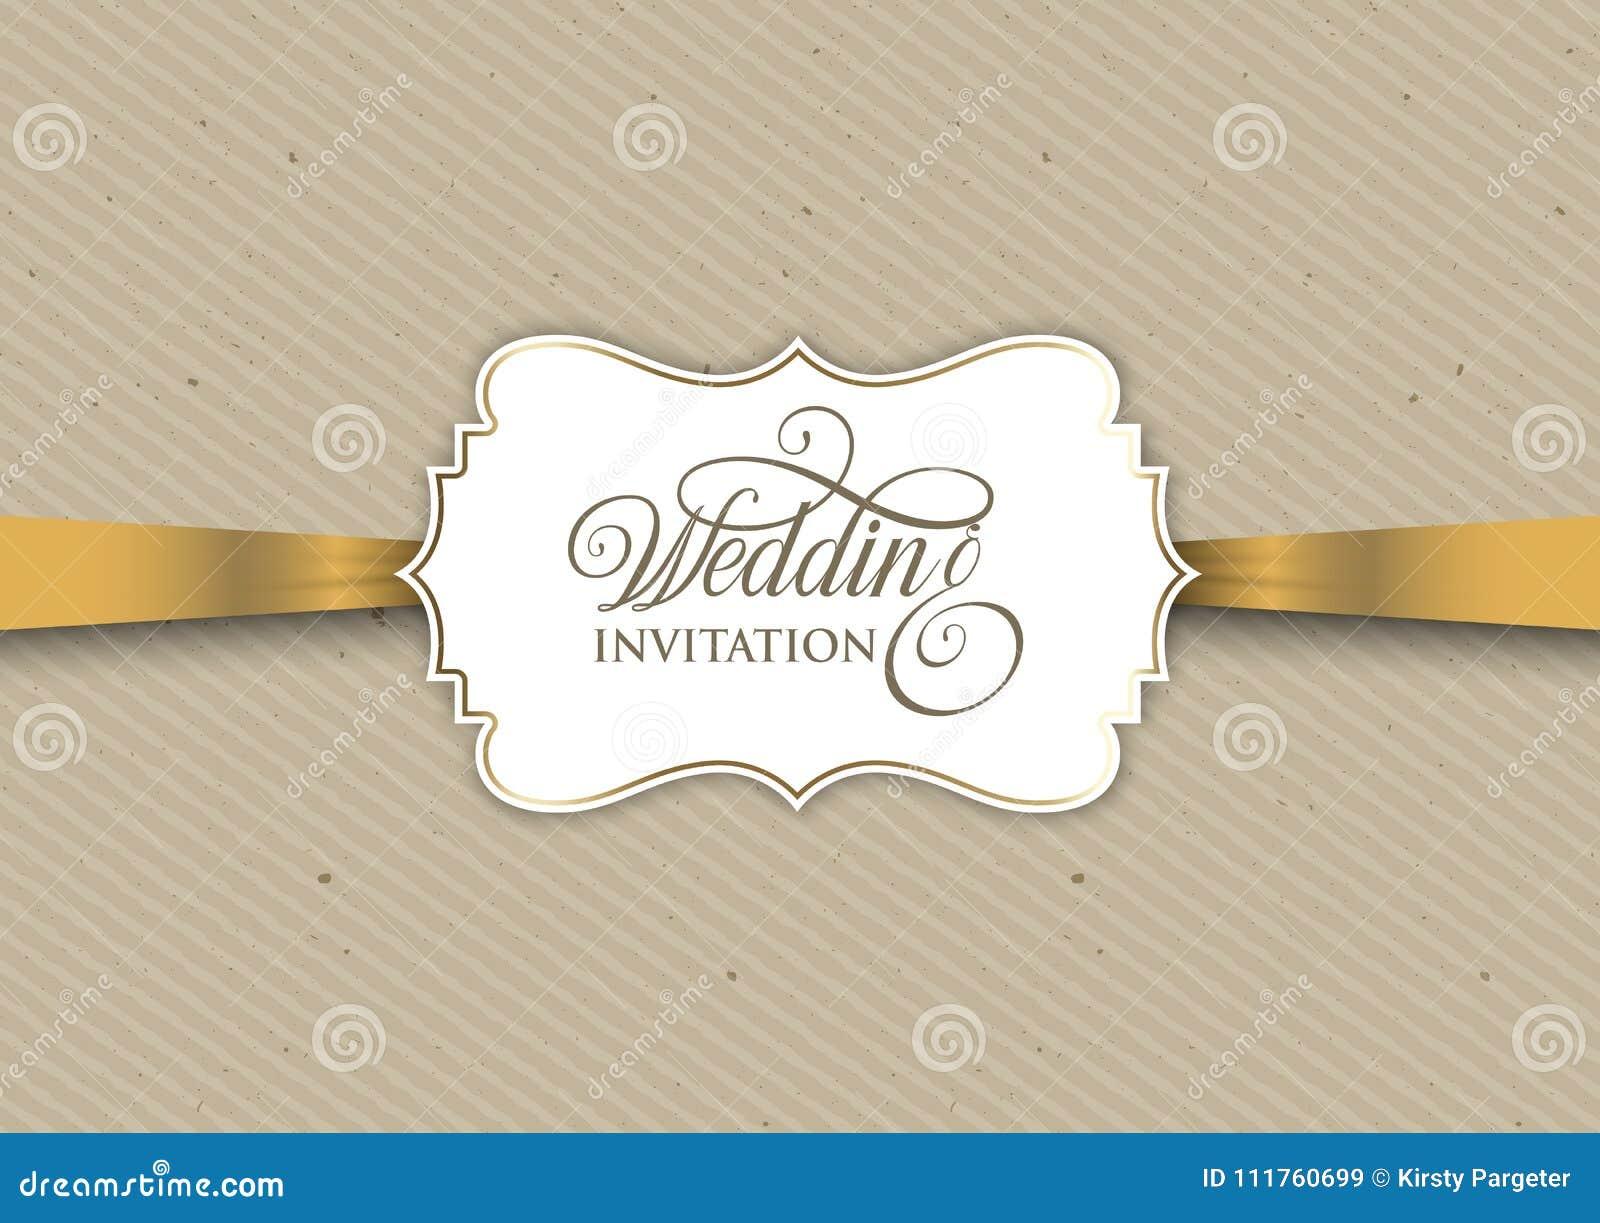 Vintage Invitation Design With Gold Ribbon Stock Vector